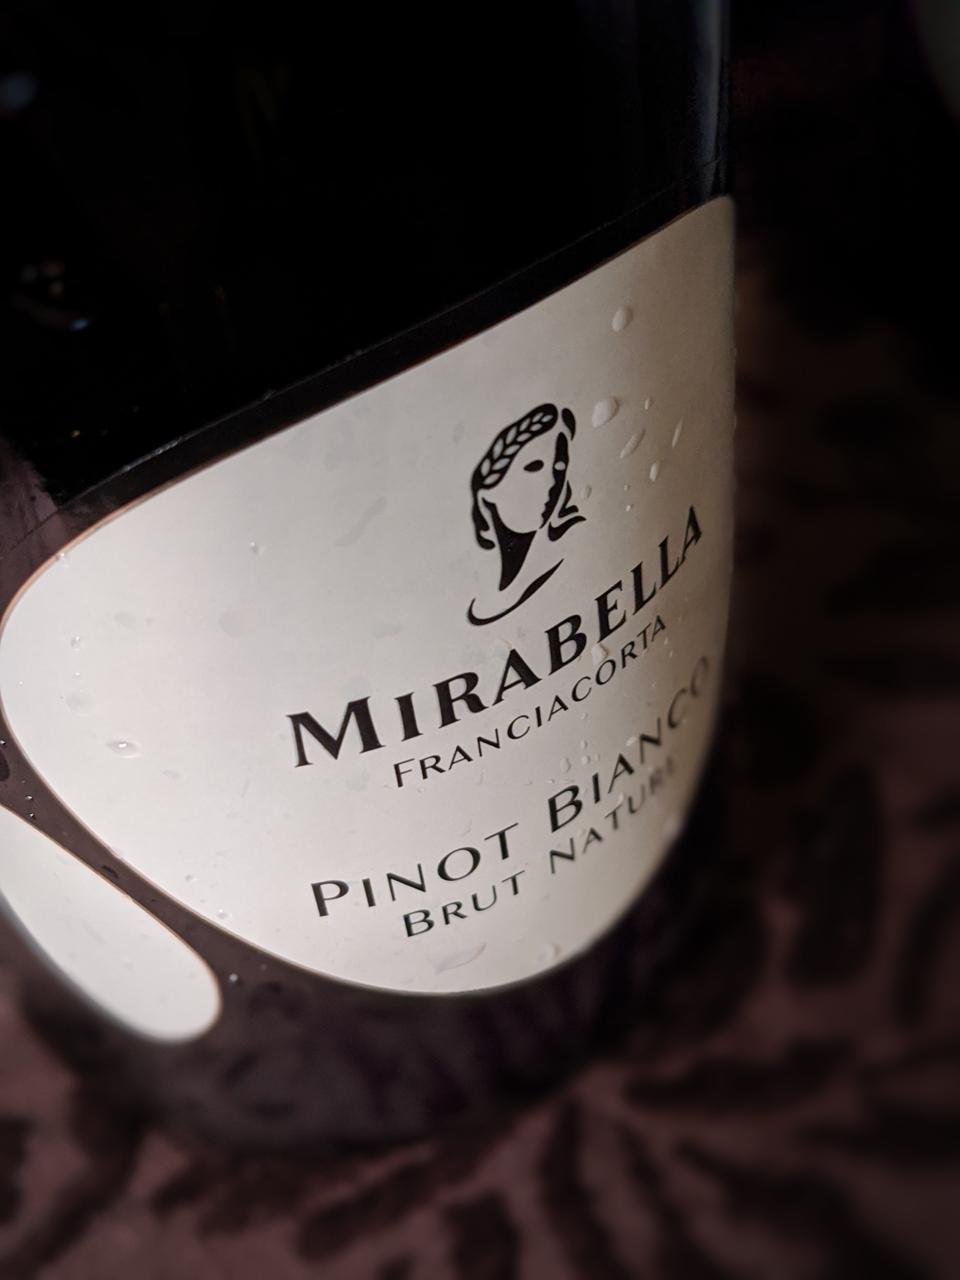 Mirabella Pinot Bianco Brut Nature